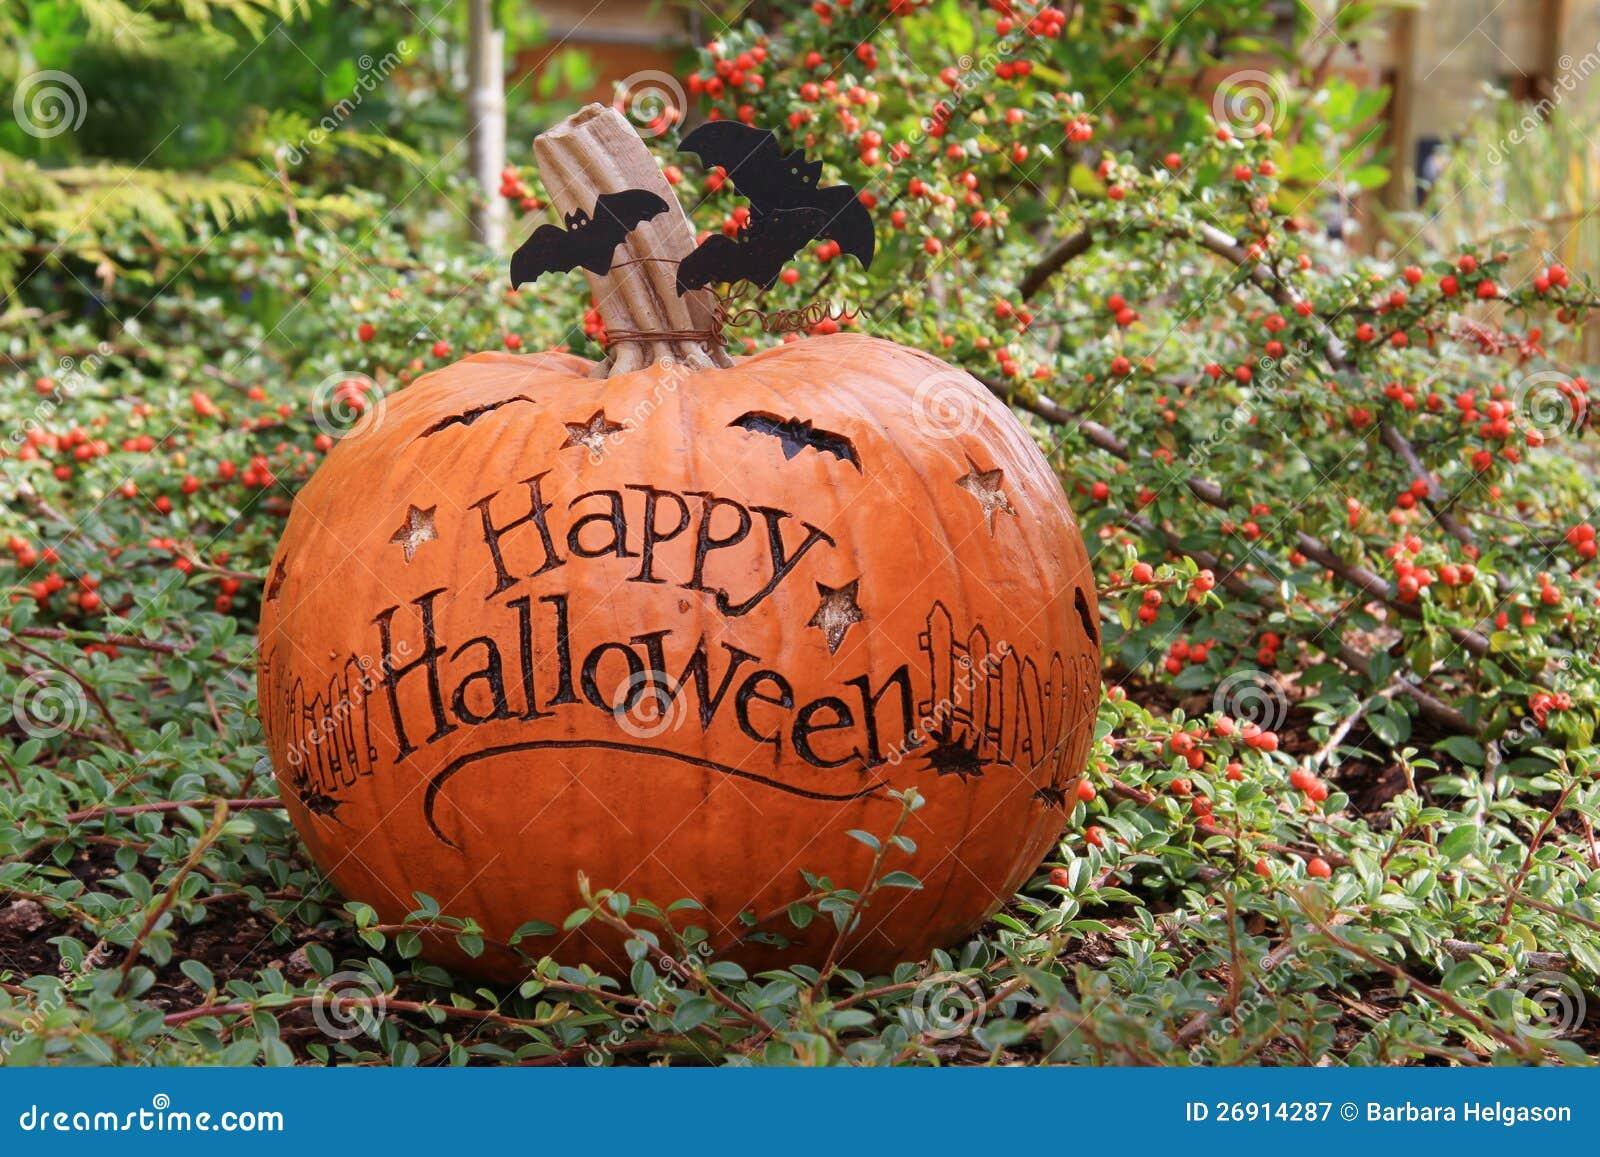 Happy Halloween Pumpkin Stock Image Image Of Leaves 26914287